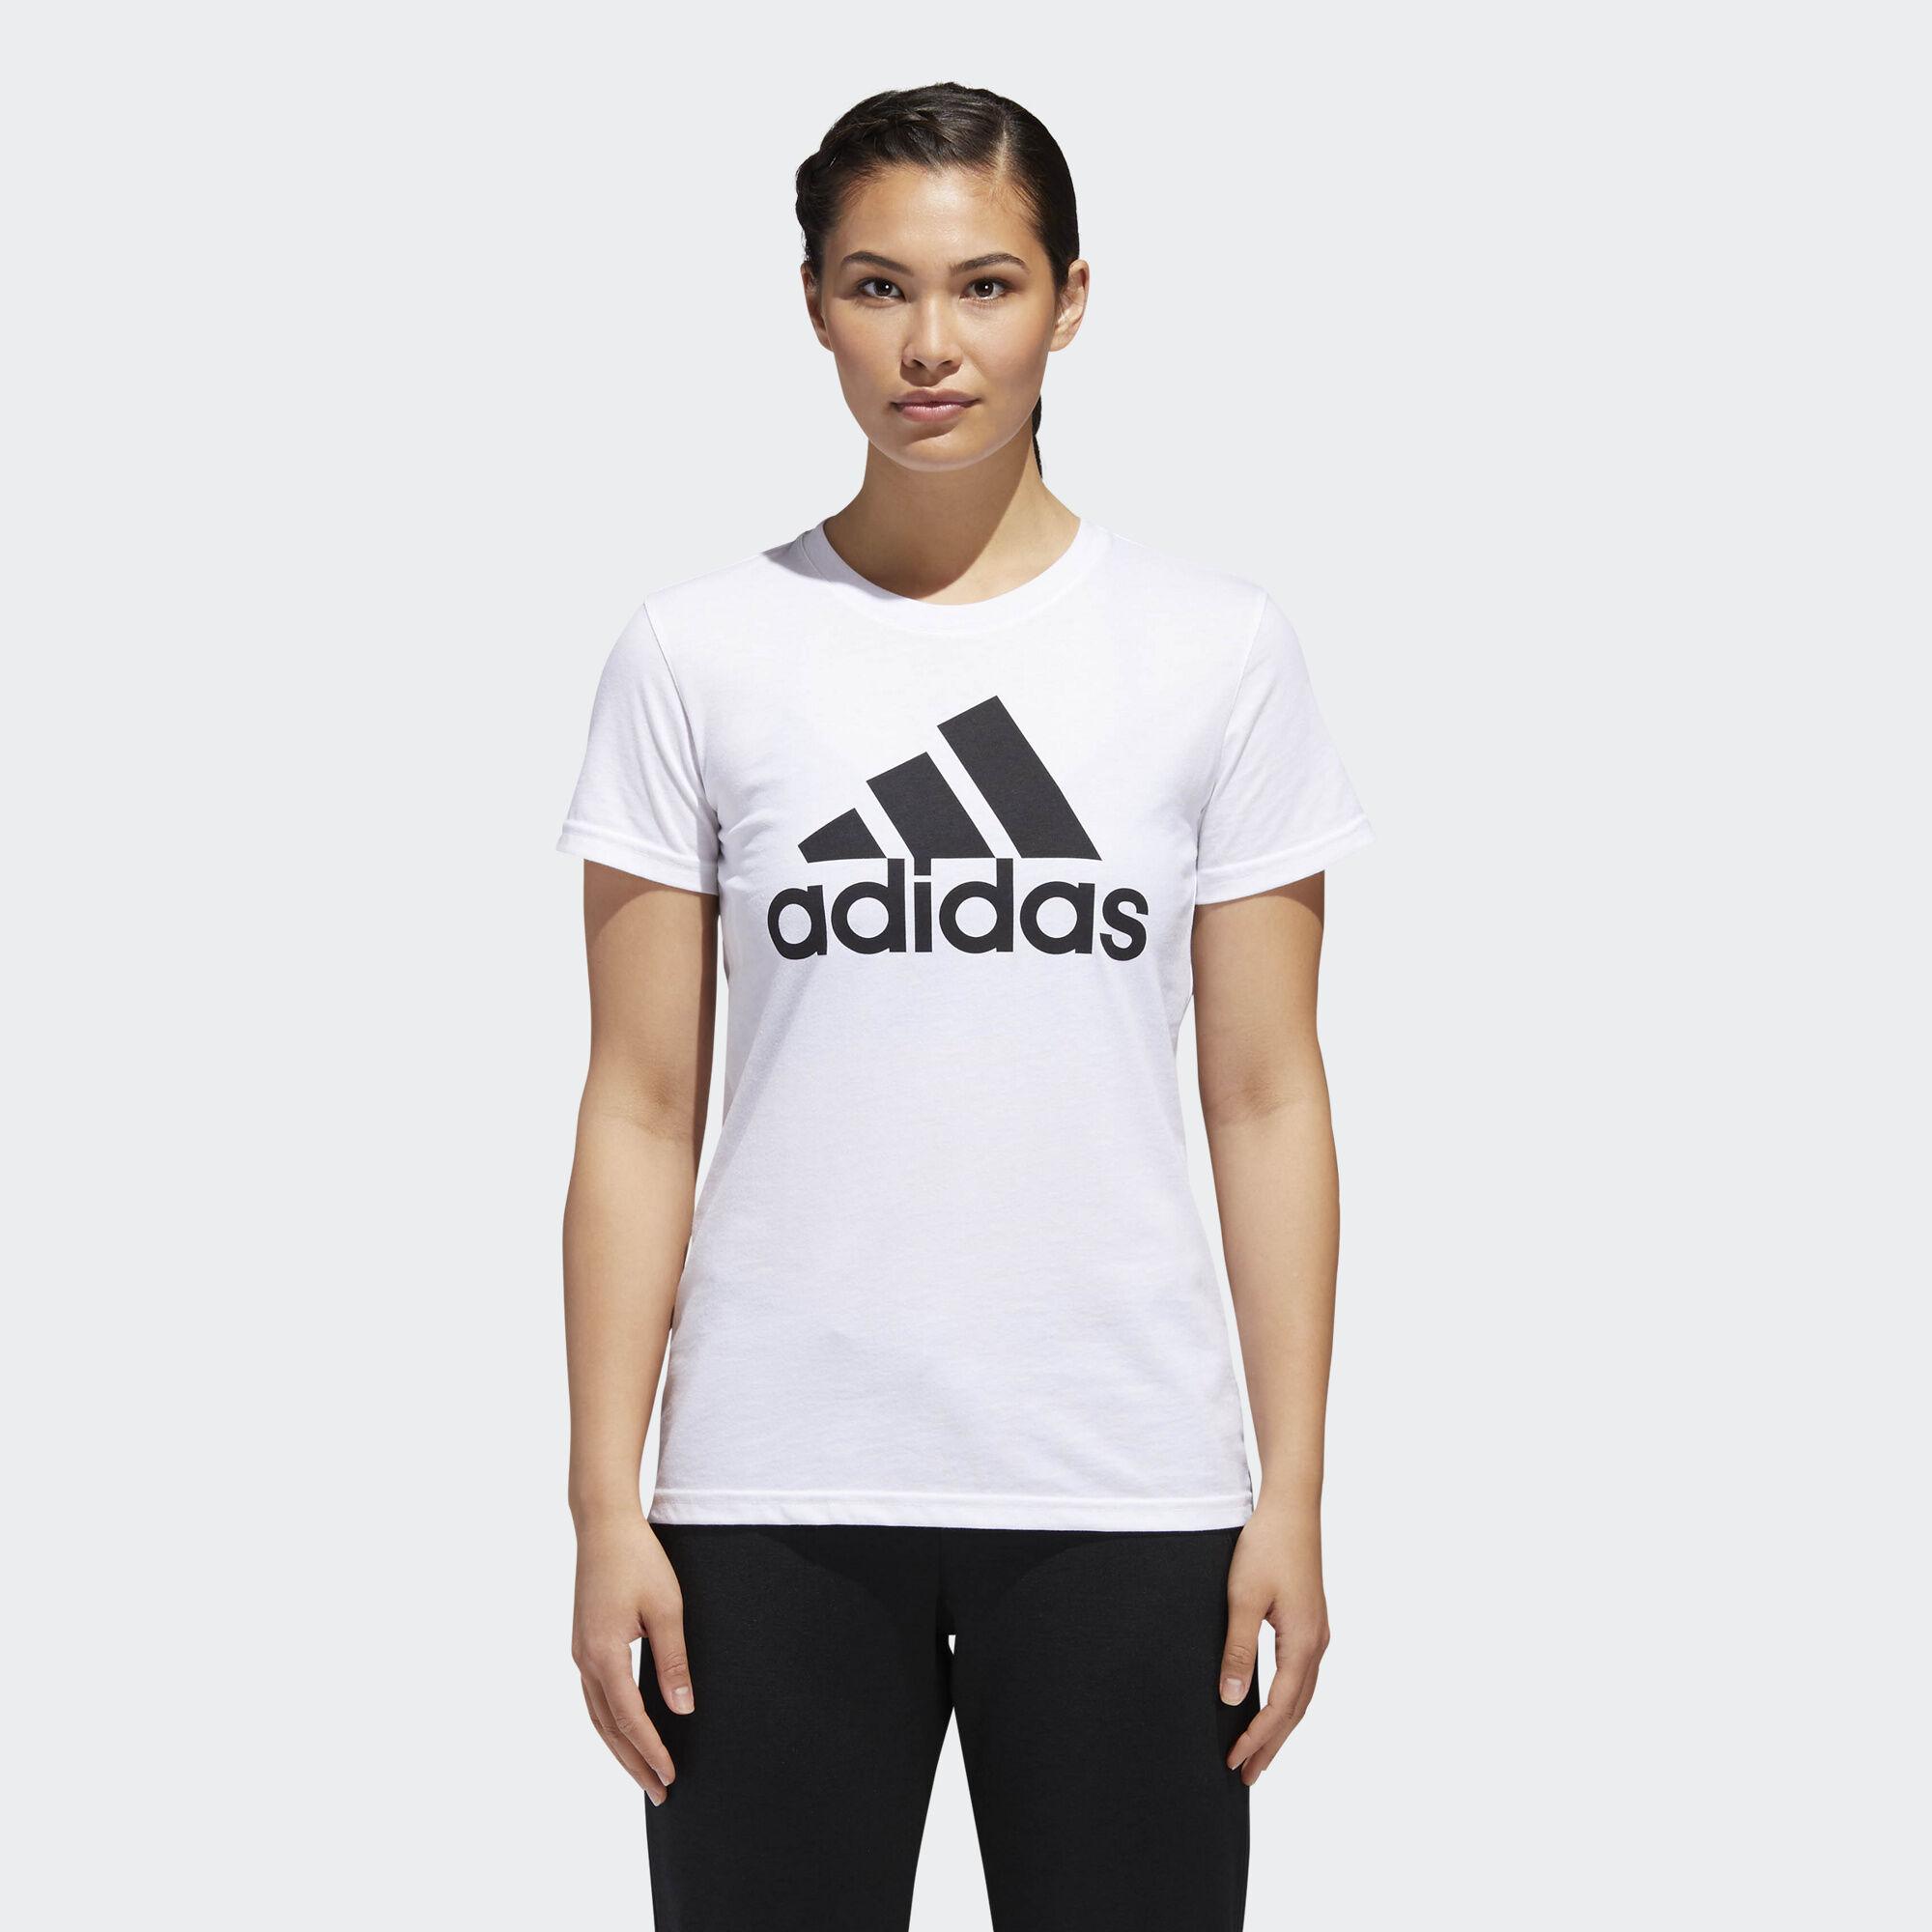 T shirt adidas white - Adidas Badge Of Sport Classic Tee White Black Ce2543